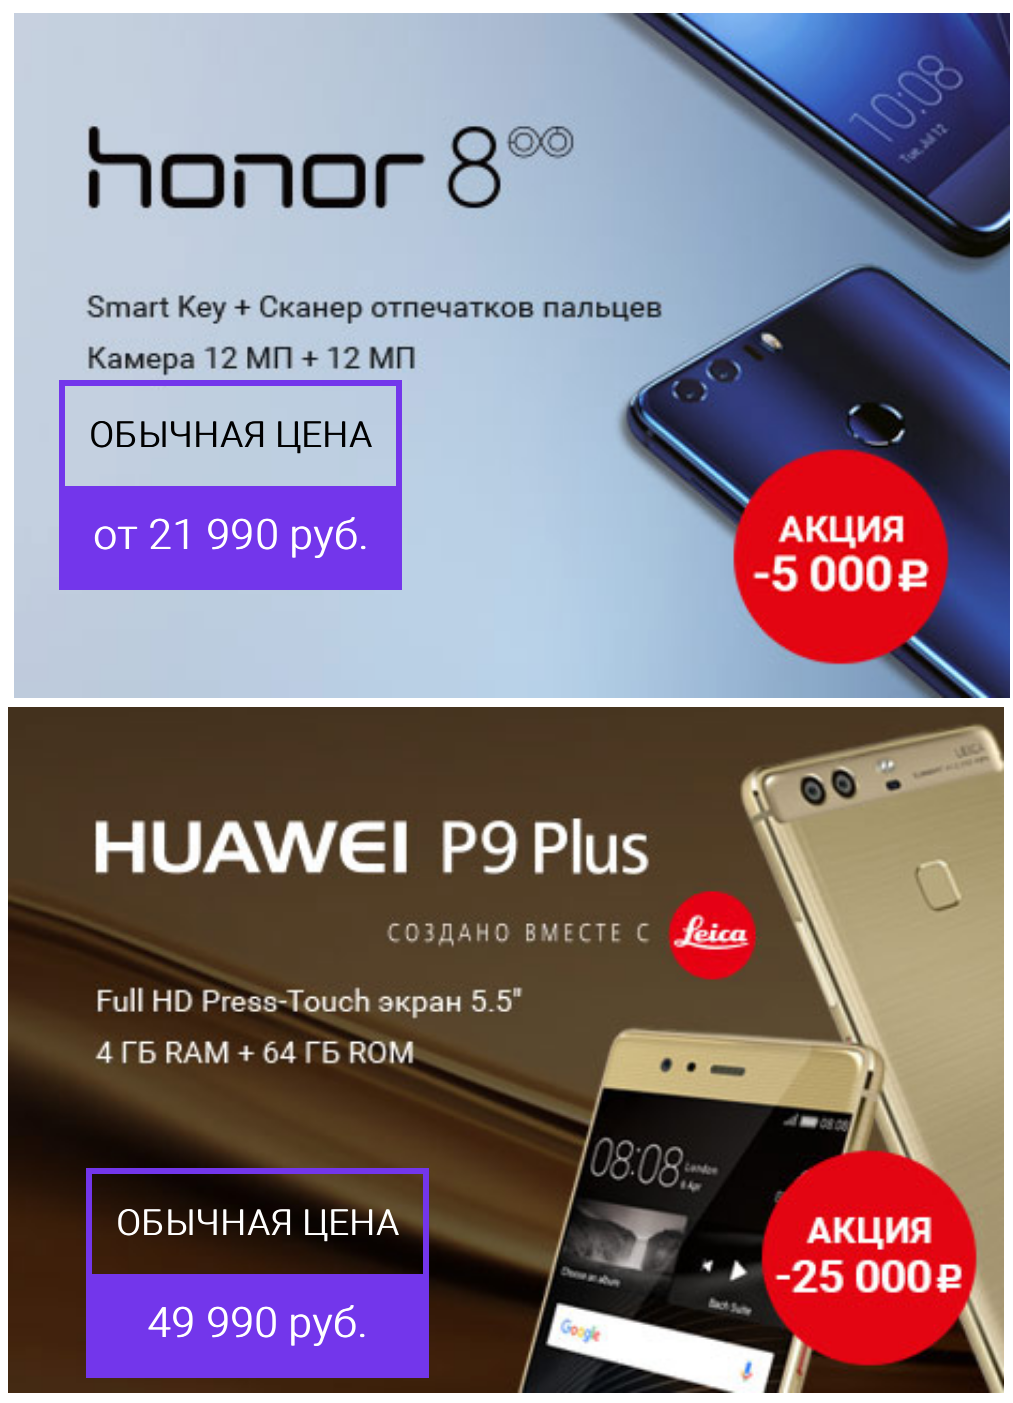 Huawei дарит скидки в честь международного дня шопинга